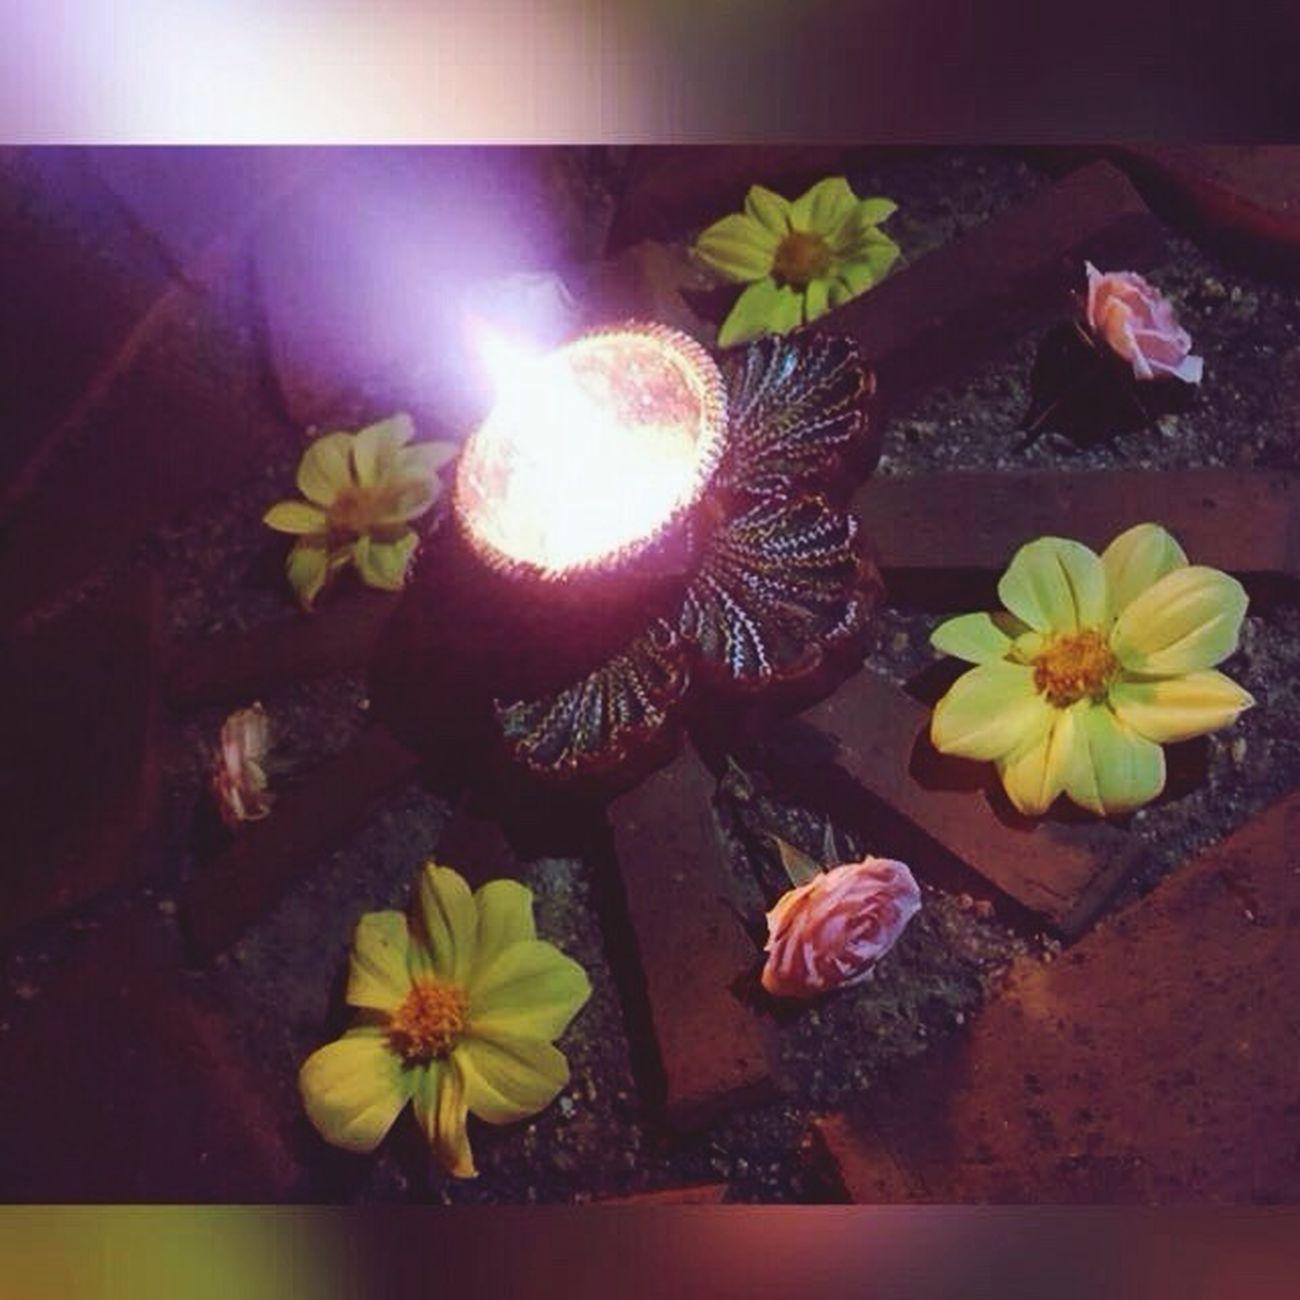 Diwali Lights Light Overcomes Darkness Close-up